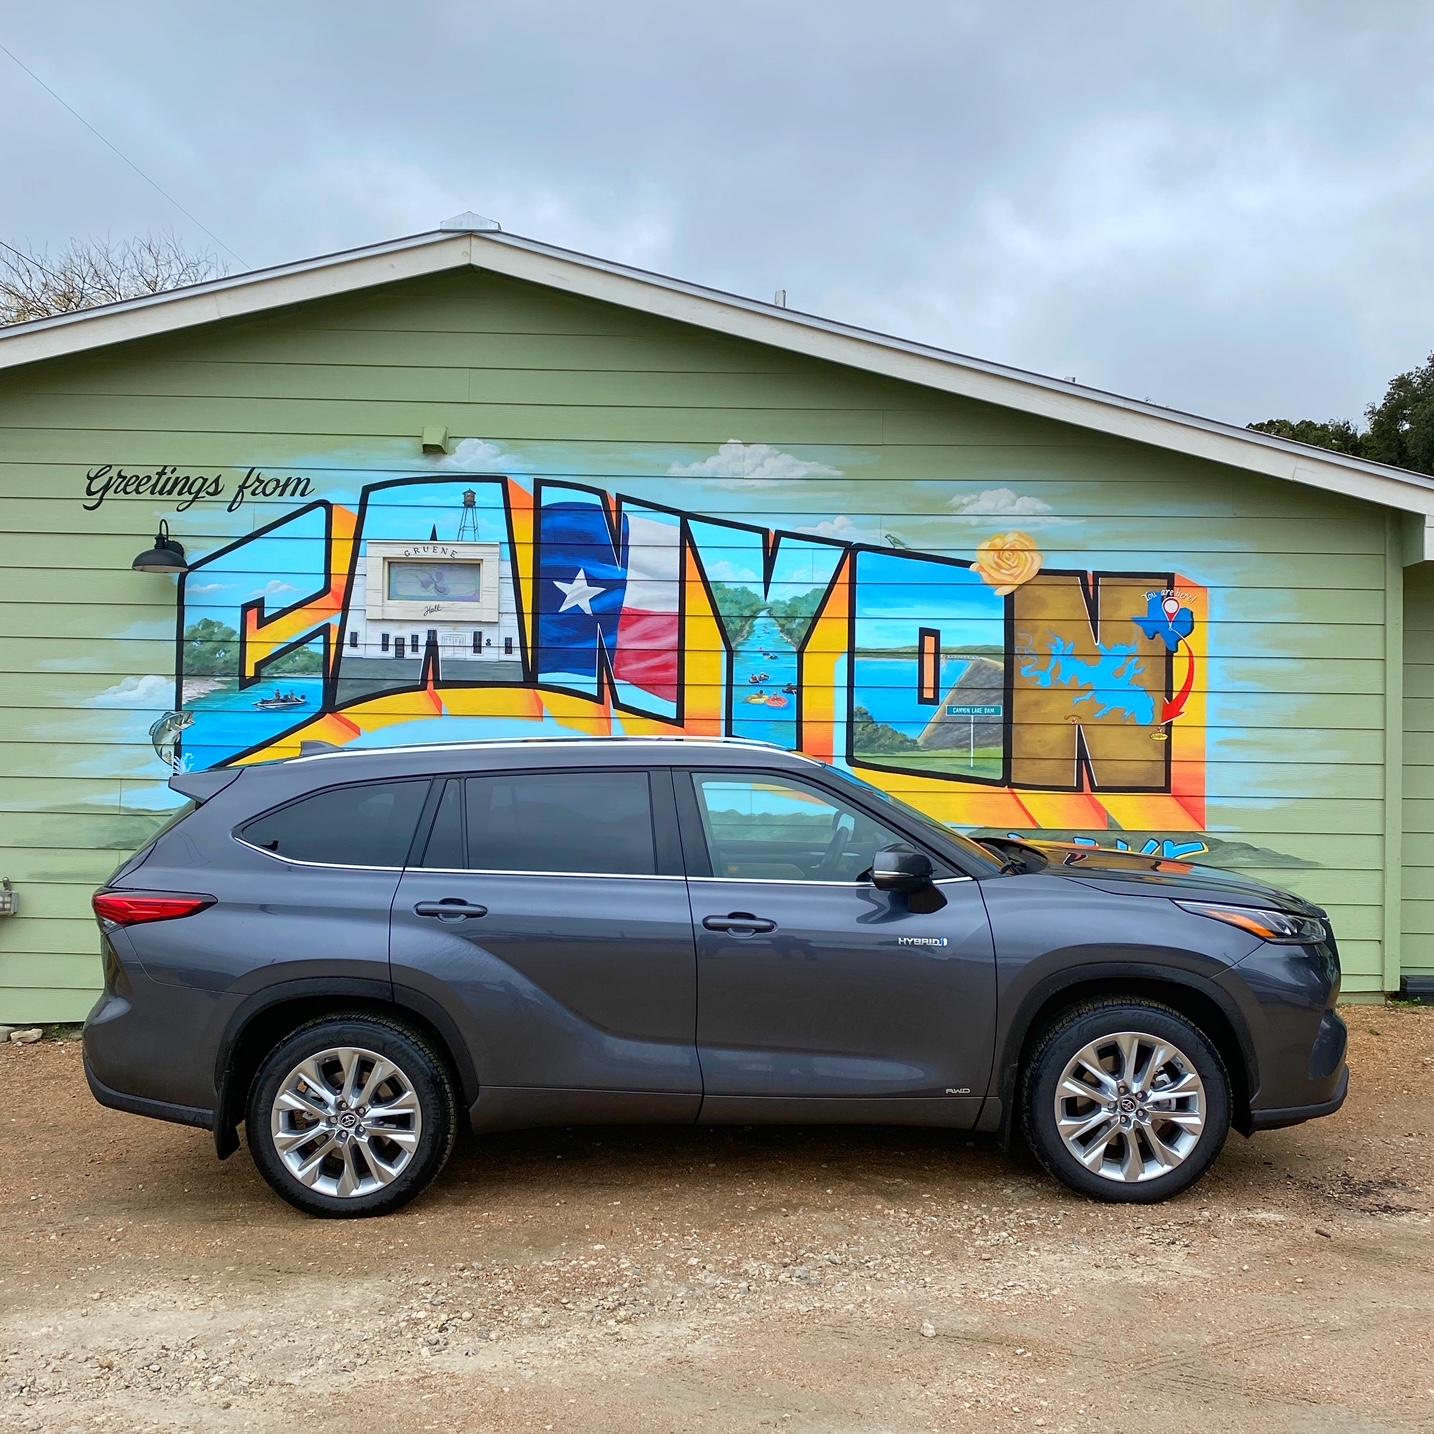 2021 Toyota Highlander exterior